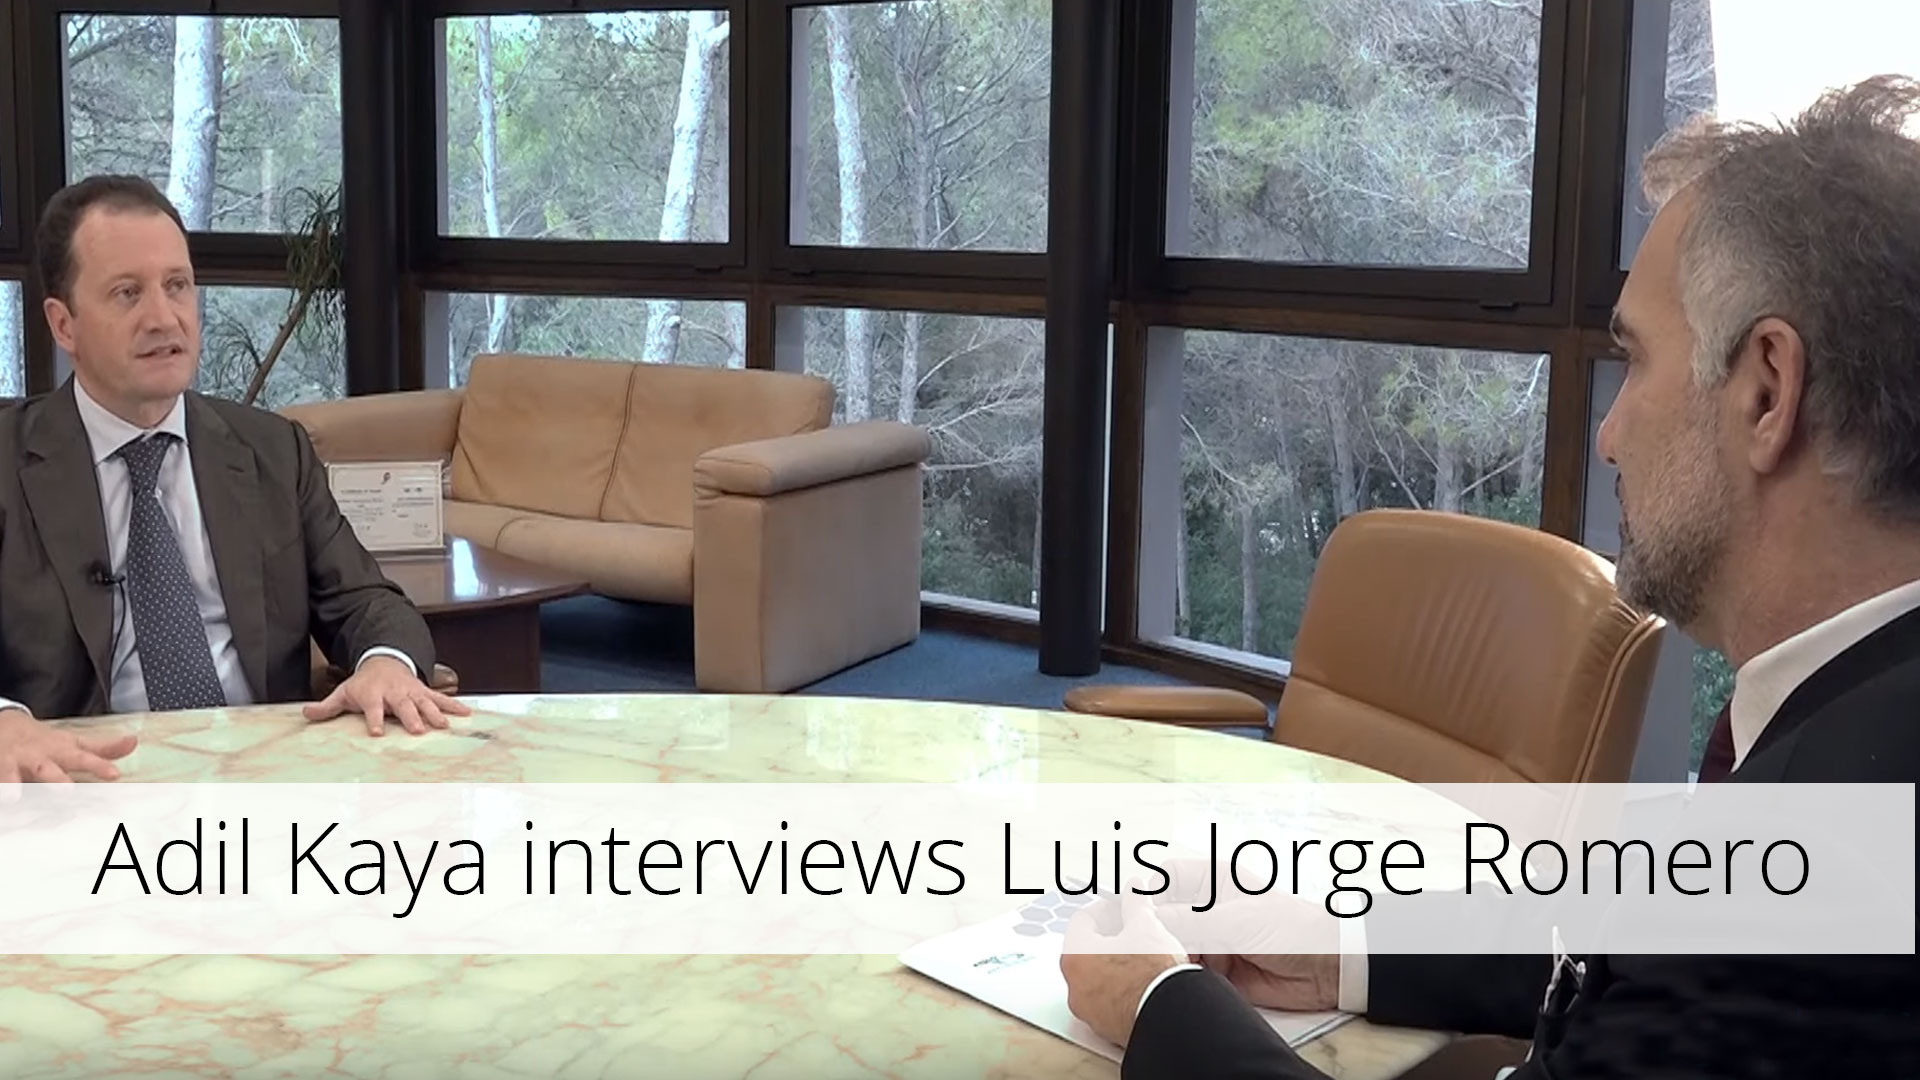 Adil Kaya interviews Luis Jorge Romero, ETSI, 3GPP